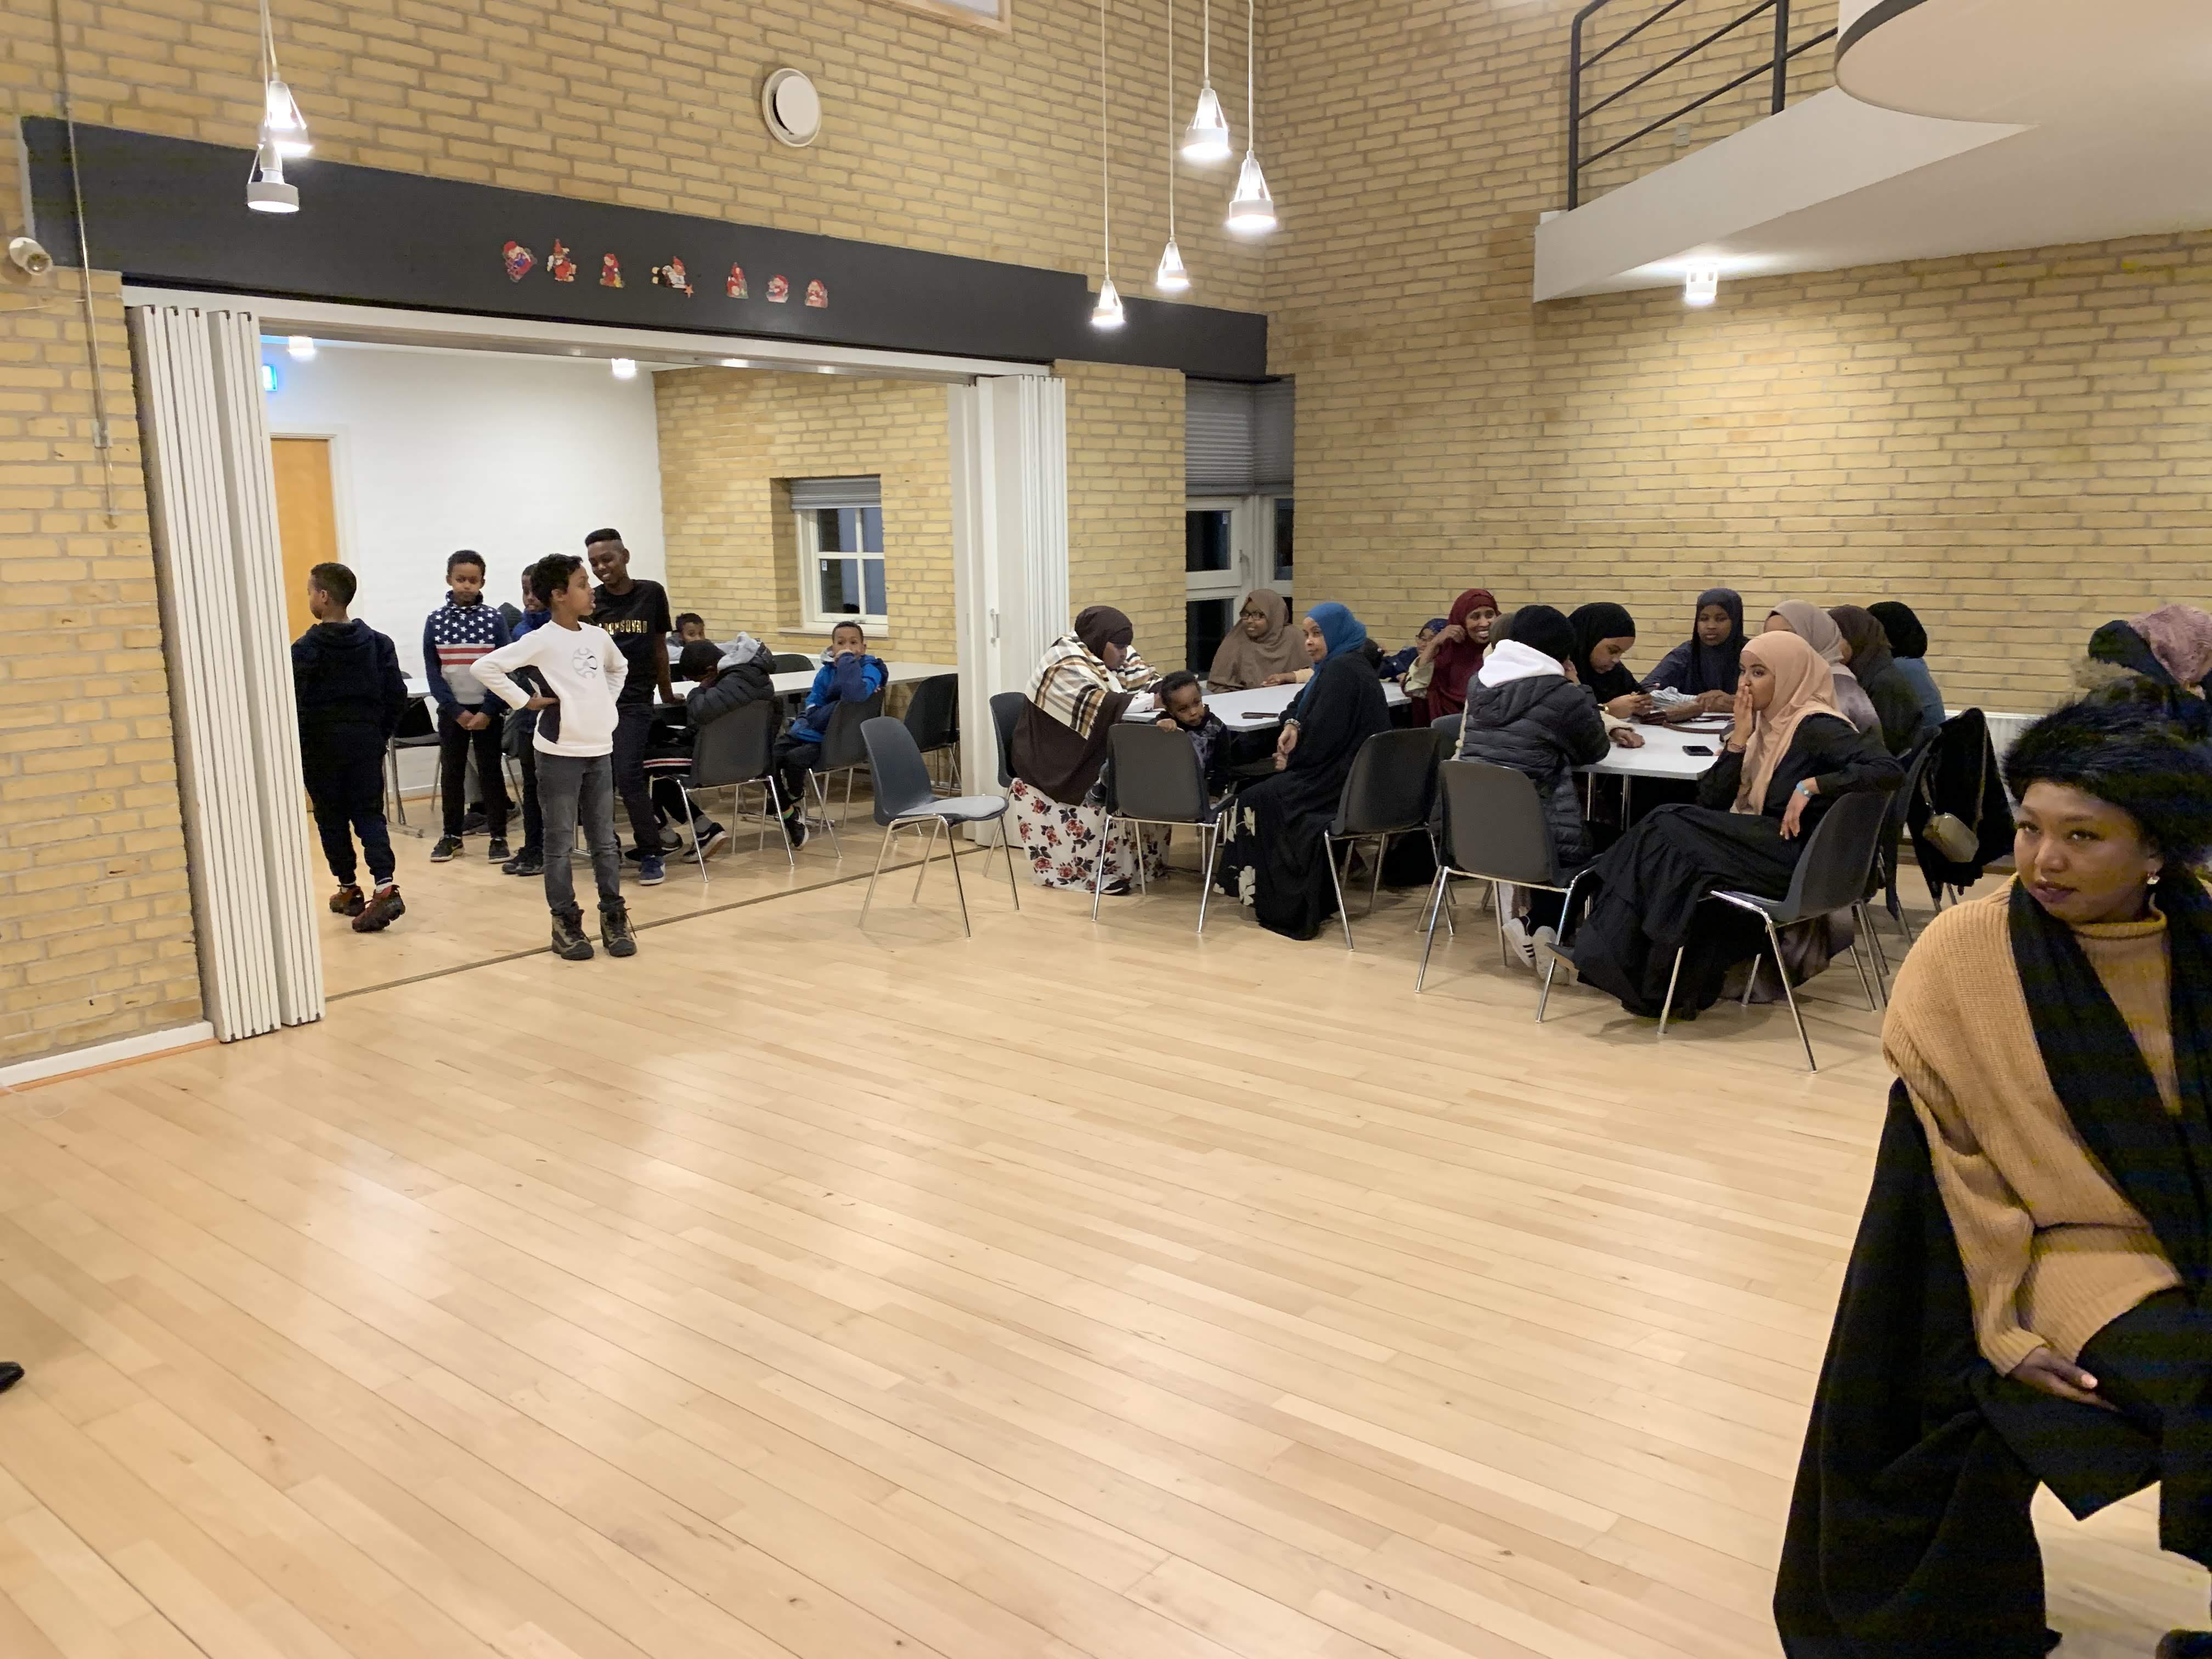 fællesspisning-den-28-12-2019-i-beboerhuset-på-Ellekonebakken-019